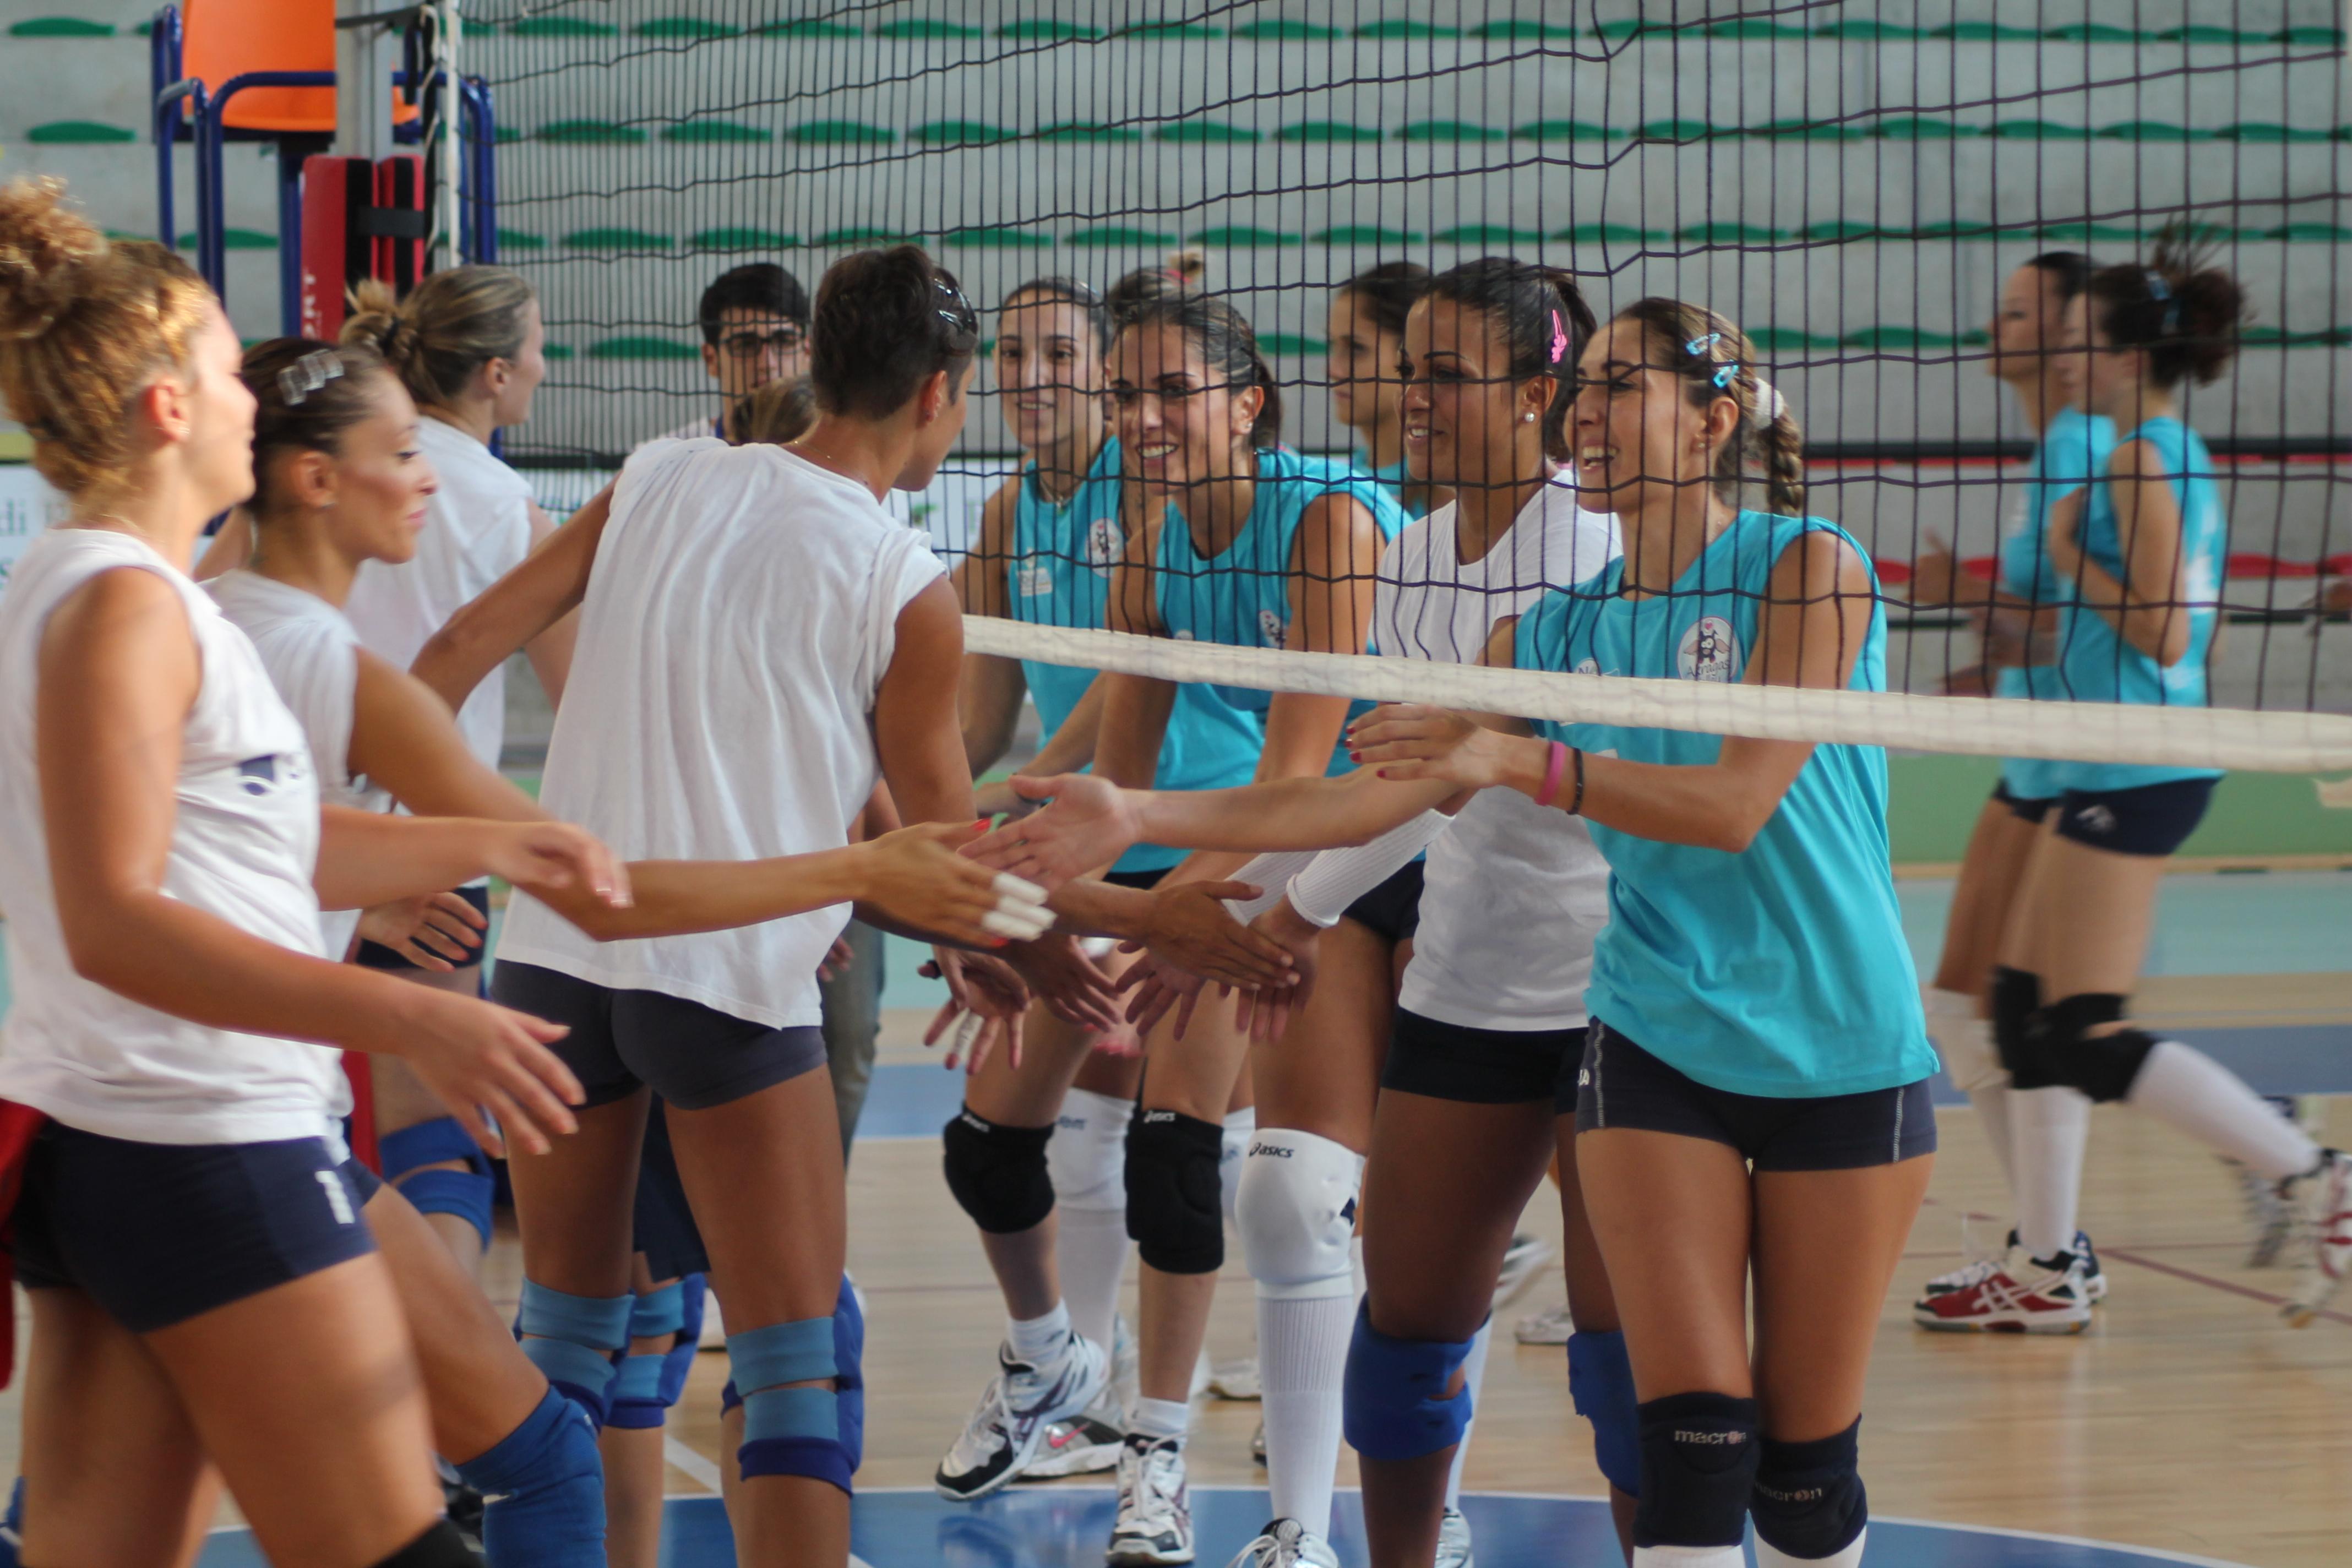 Volley: Costaverde – Akragas – Le interviste post-gara (Video)